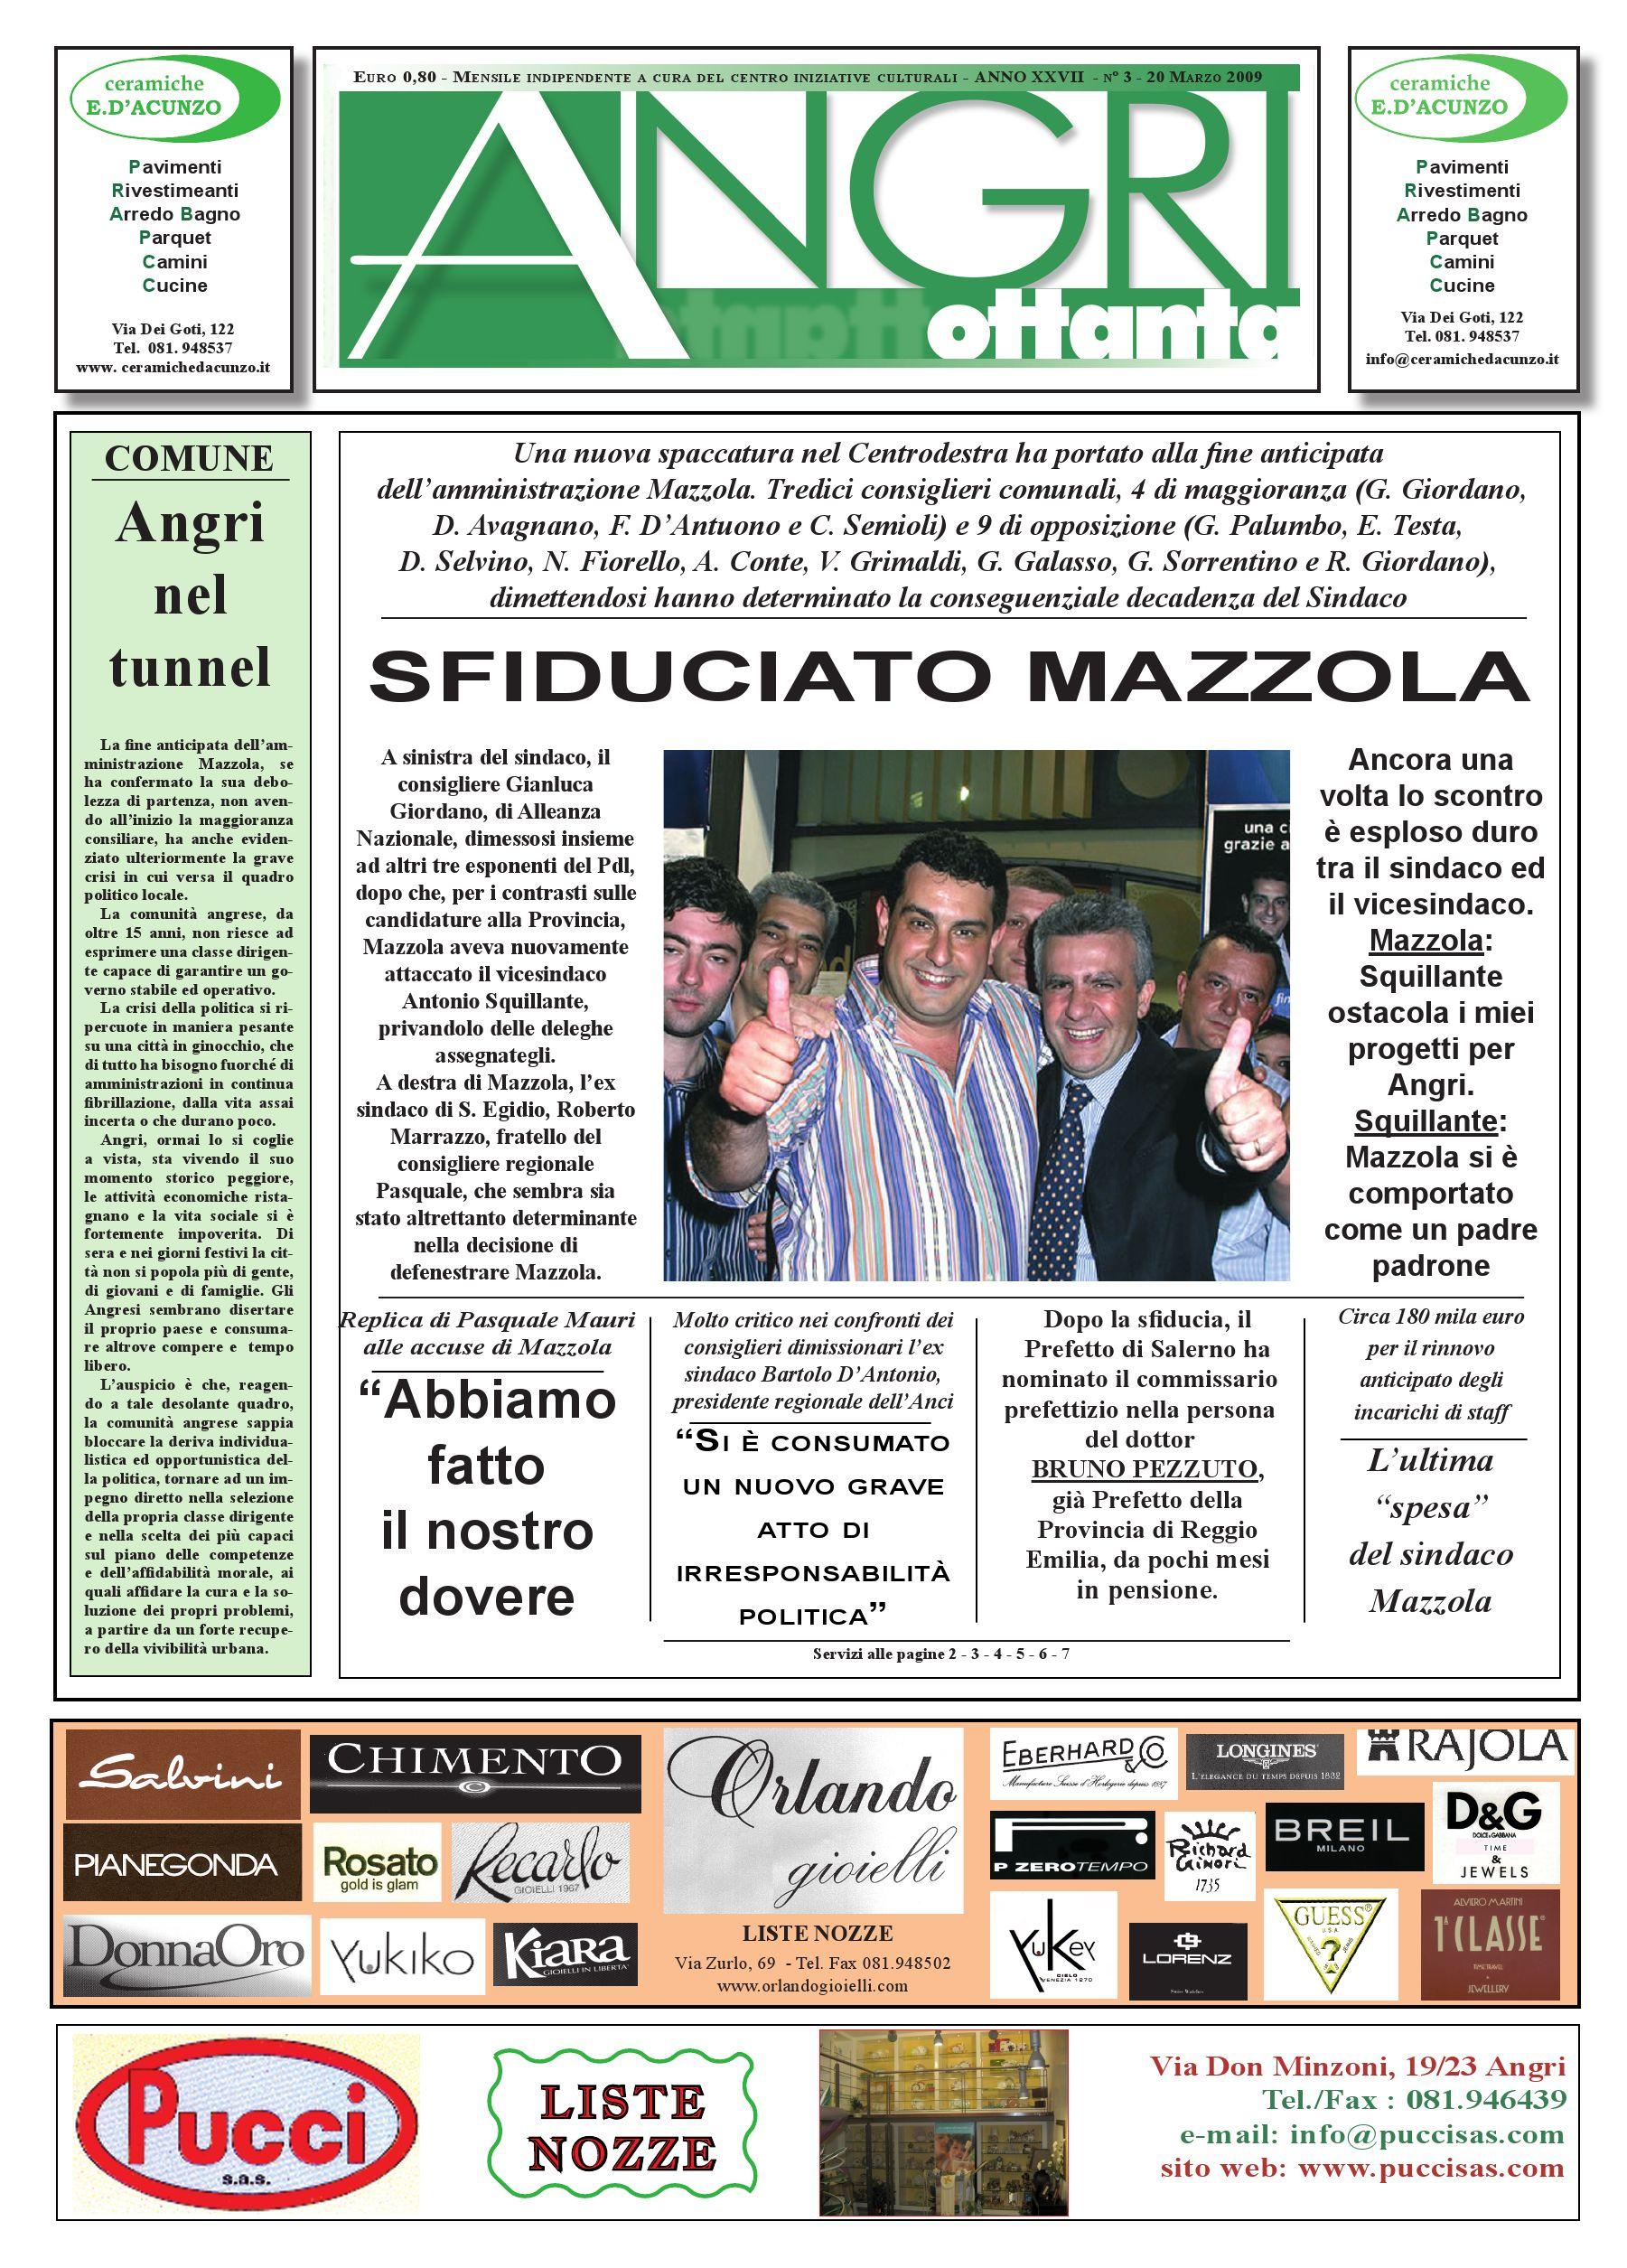 angri80.mar.09 by piazzadoria piazzadoria - issuu - Arredo Bagno Angri